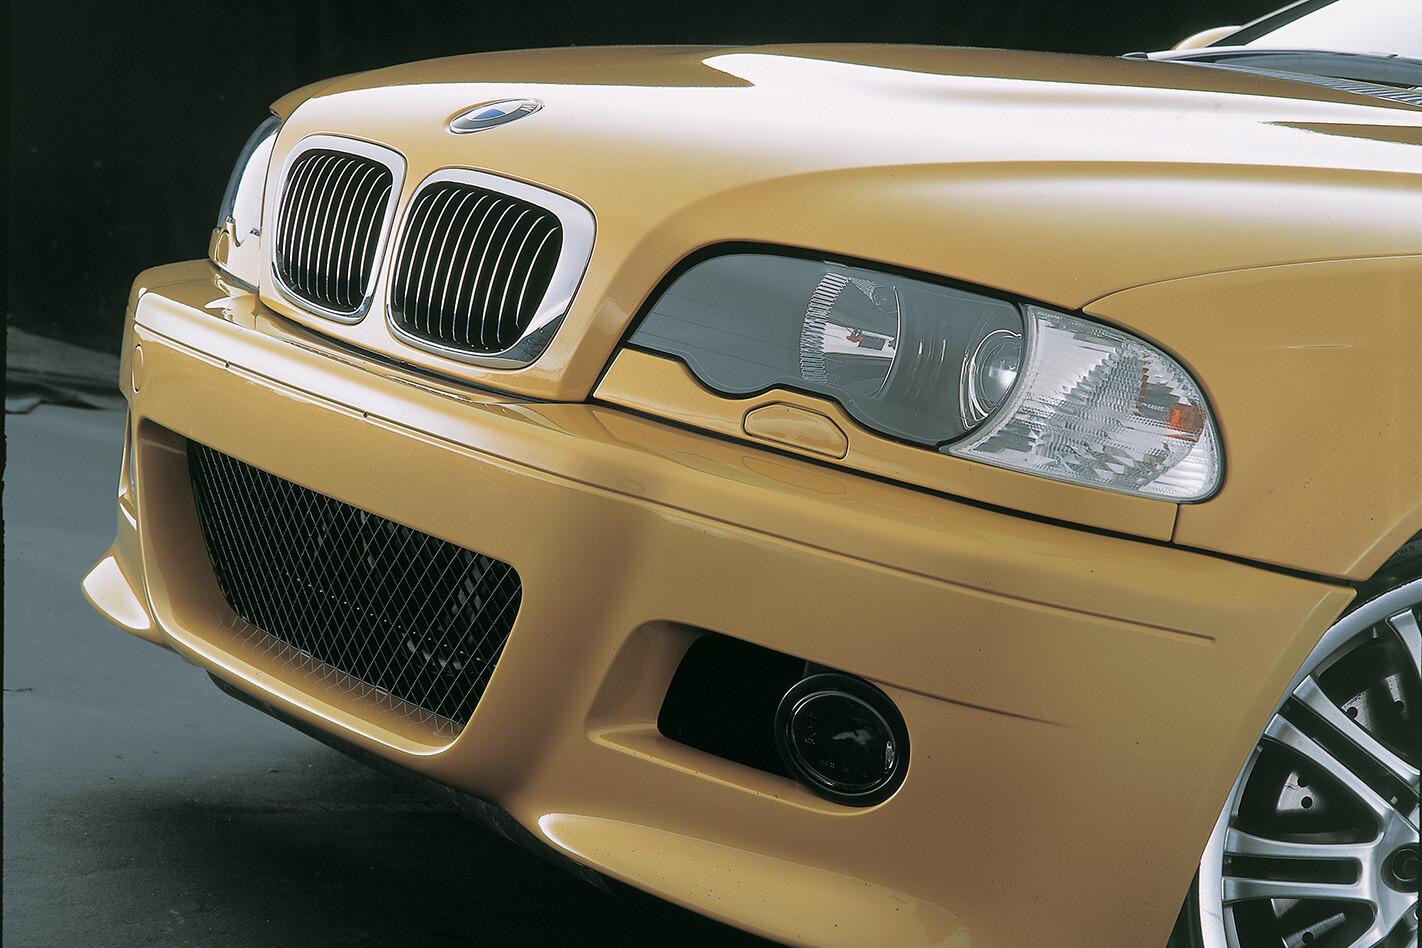 2002-BMW-E46-M3-HEADLIGHTS.jpg